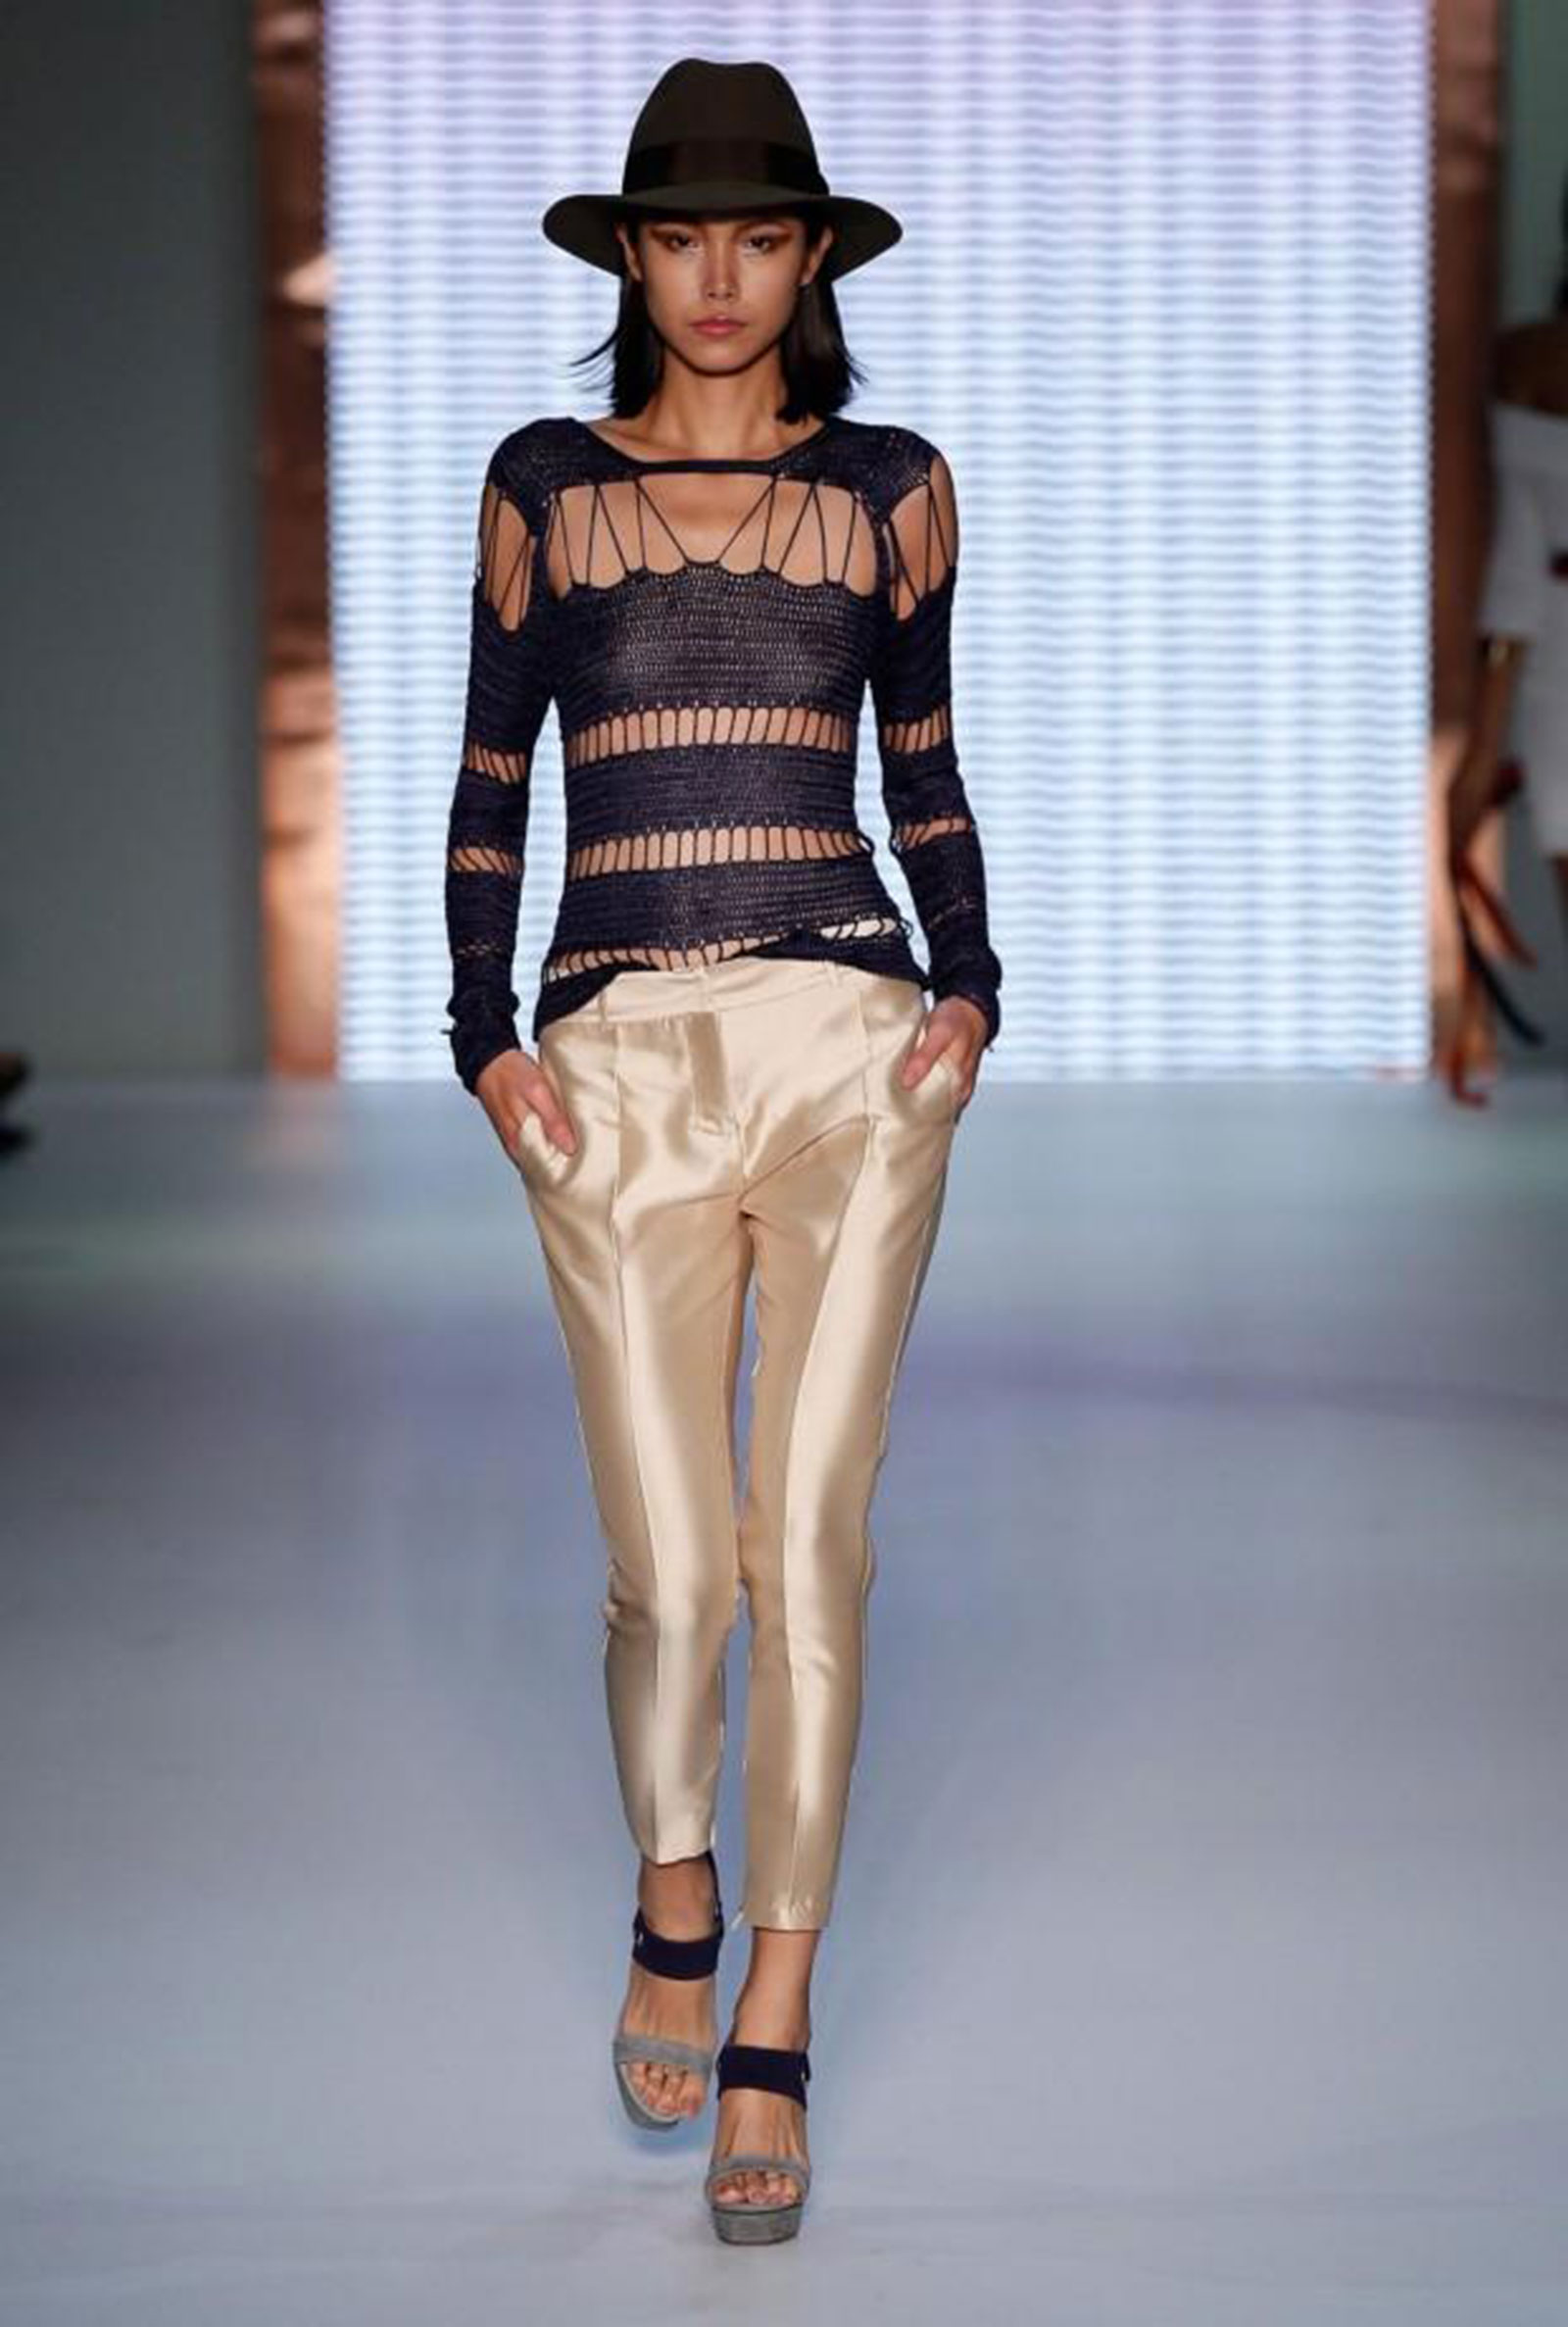 The_Ink_Collecive_Australian_Fashion_2011_13.jpg